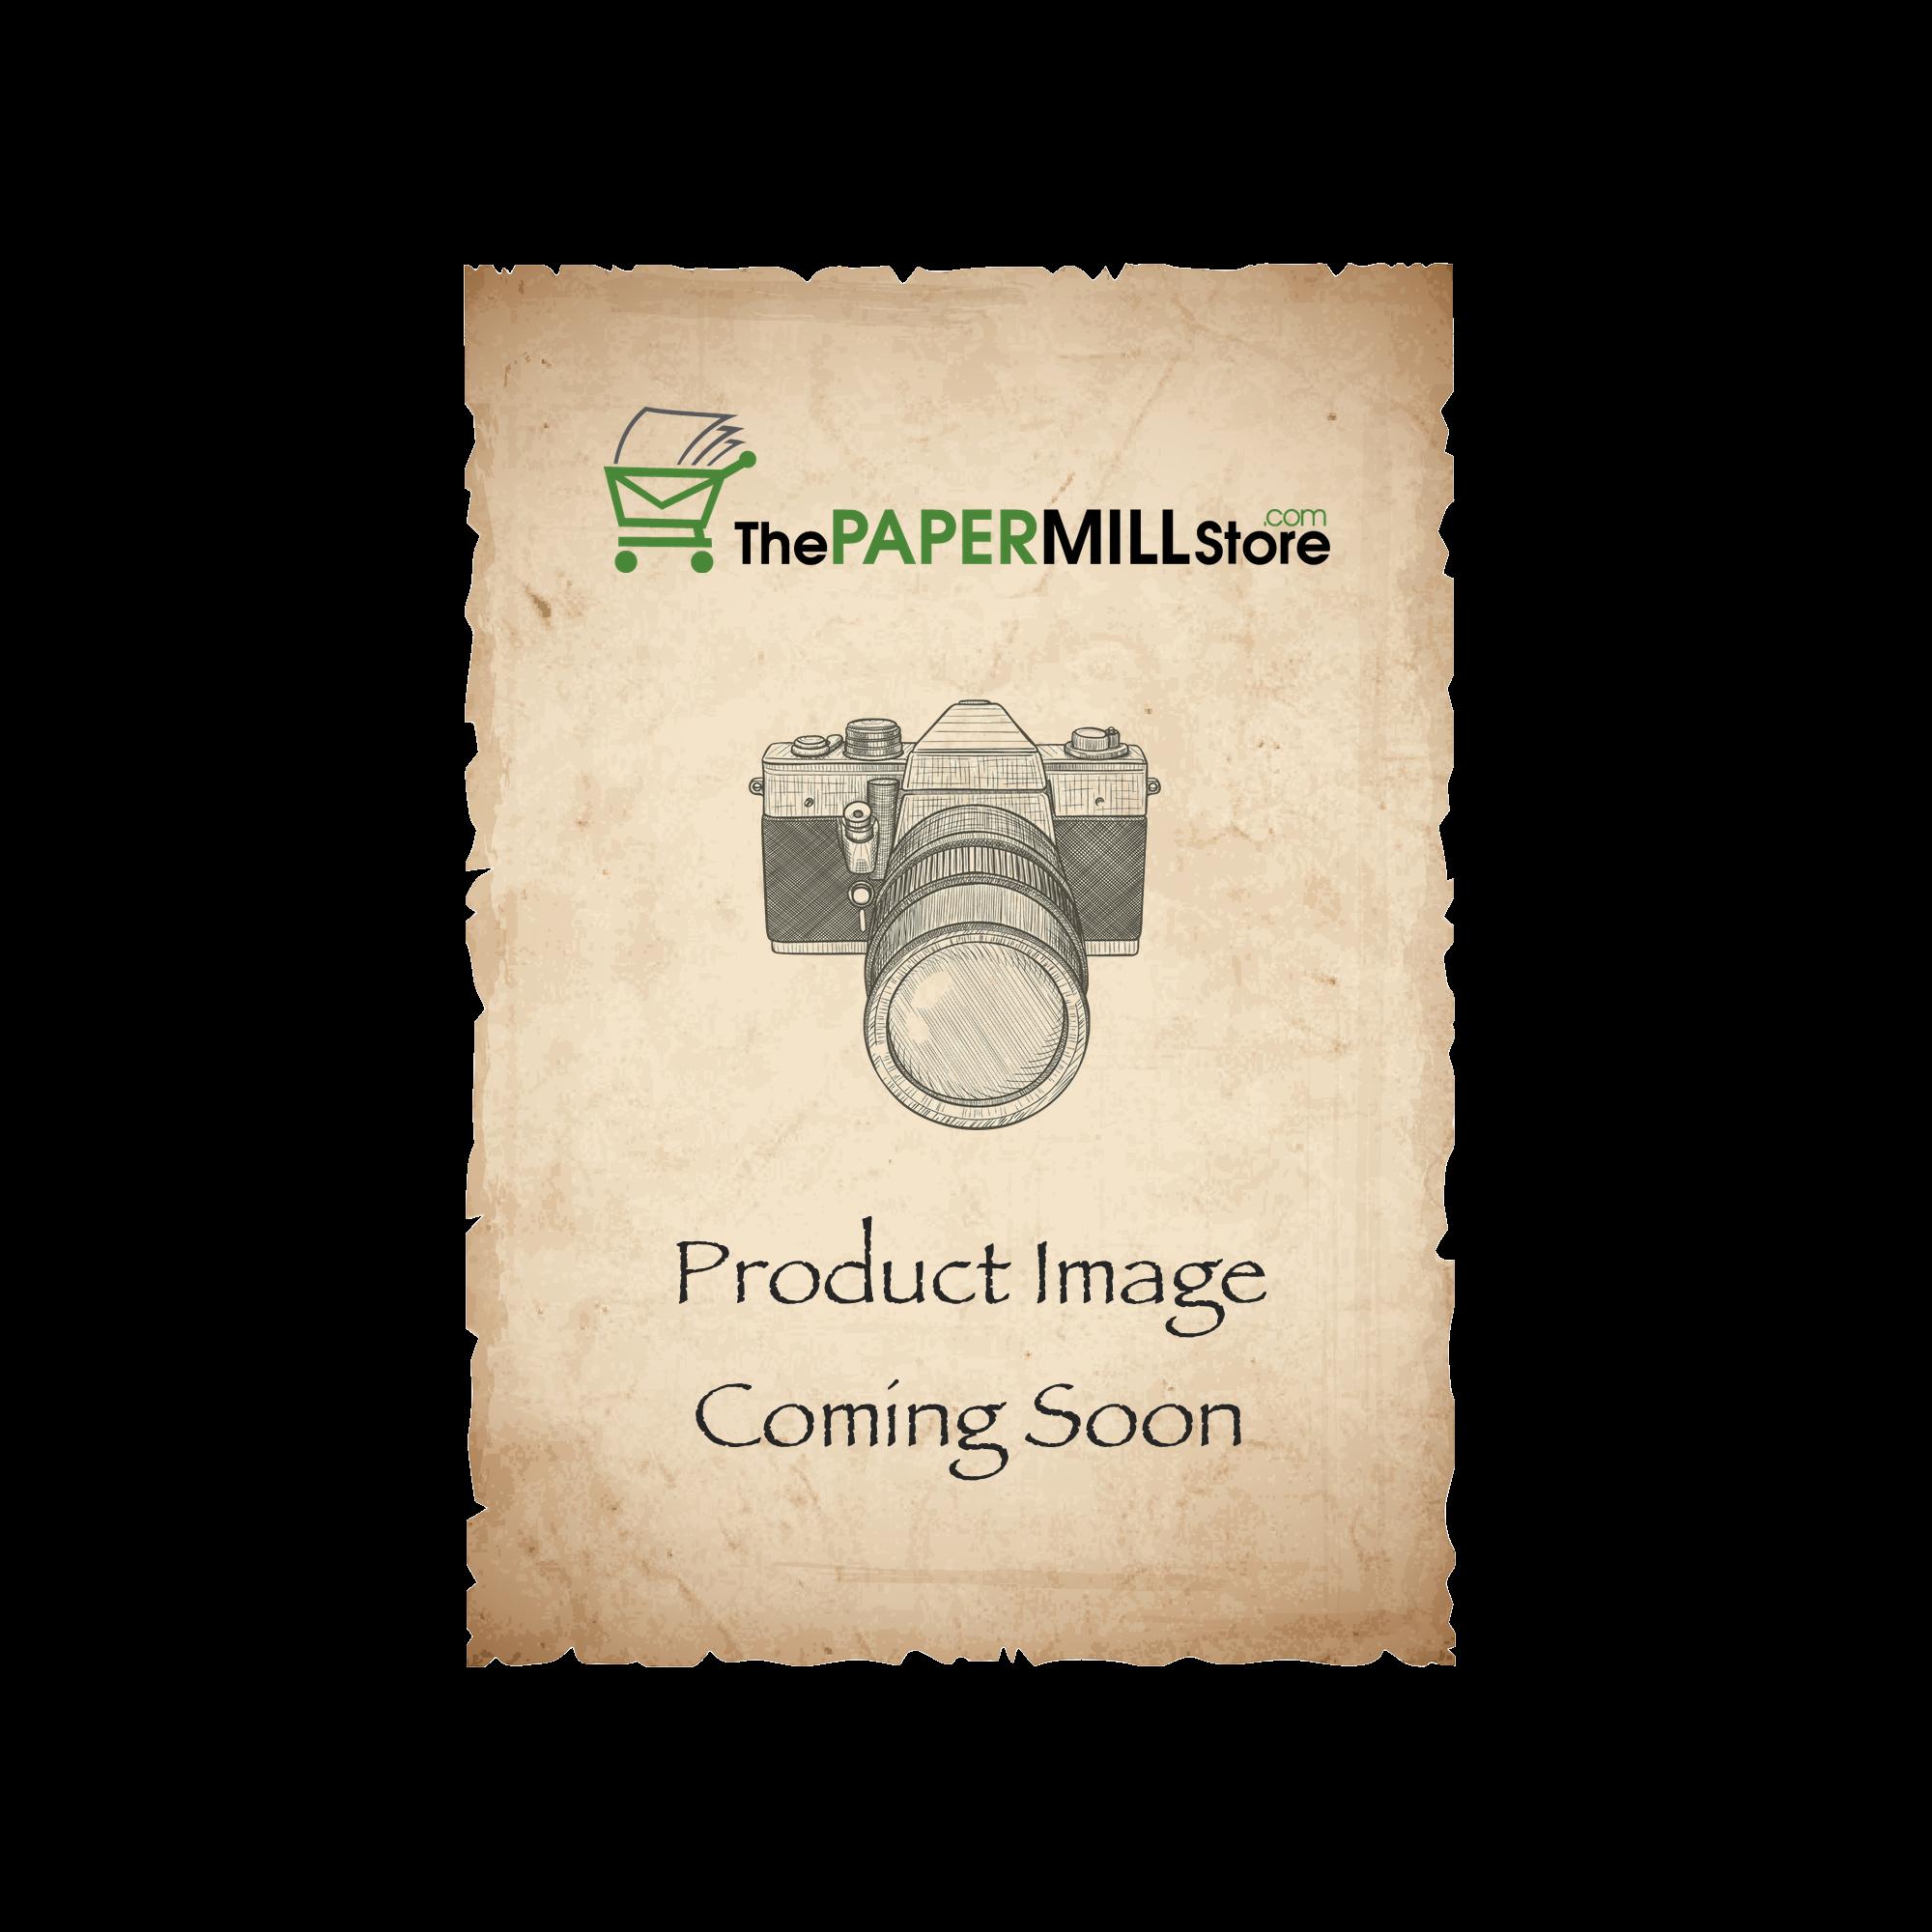 Loop Antique Vellum Milkweed Envelopes - No. 10 Commercial (4 1/8 x 9 1/2) 80 lb Text Antique Vellum  100% Recycled 500 per Box